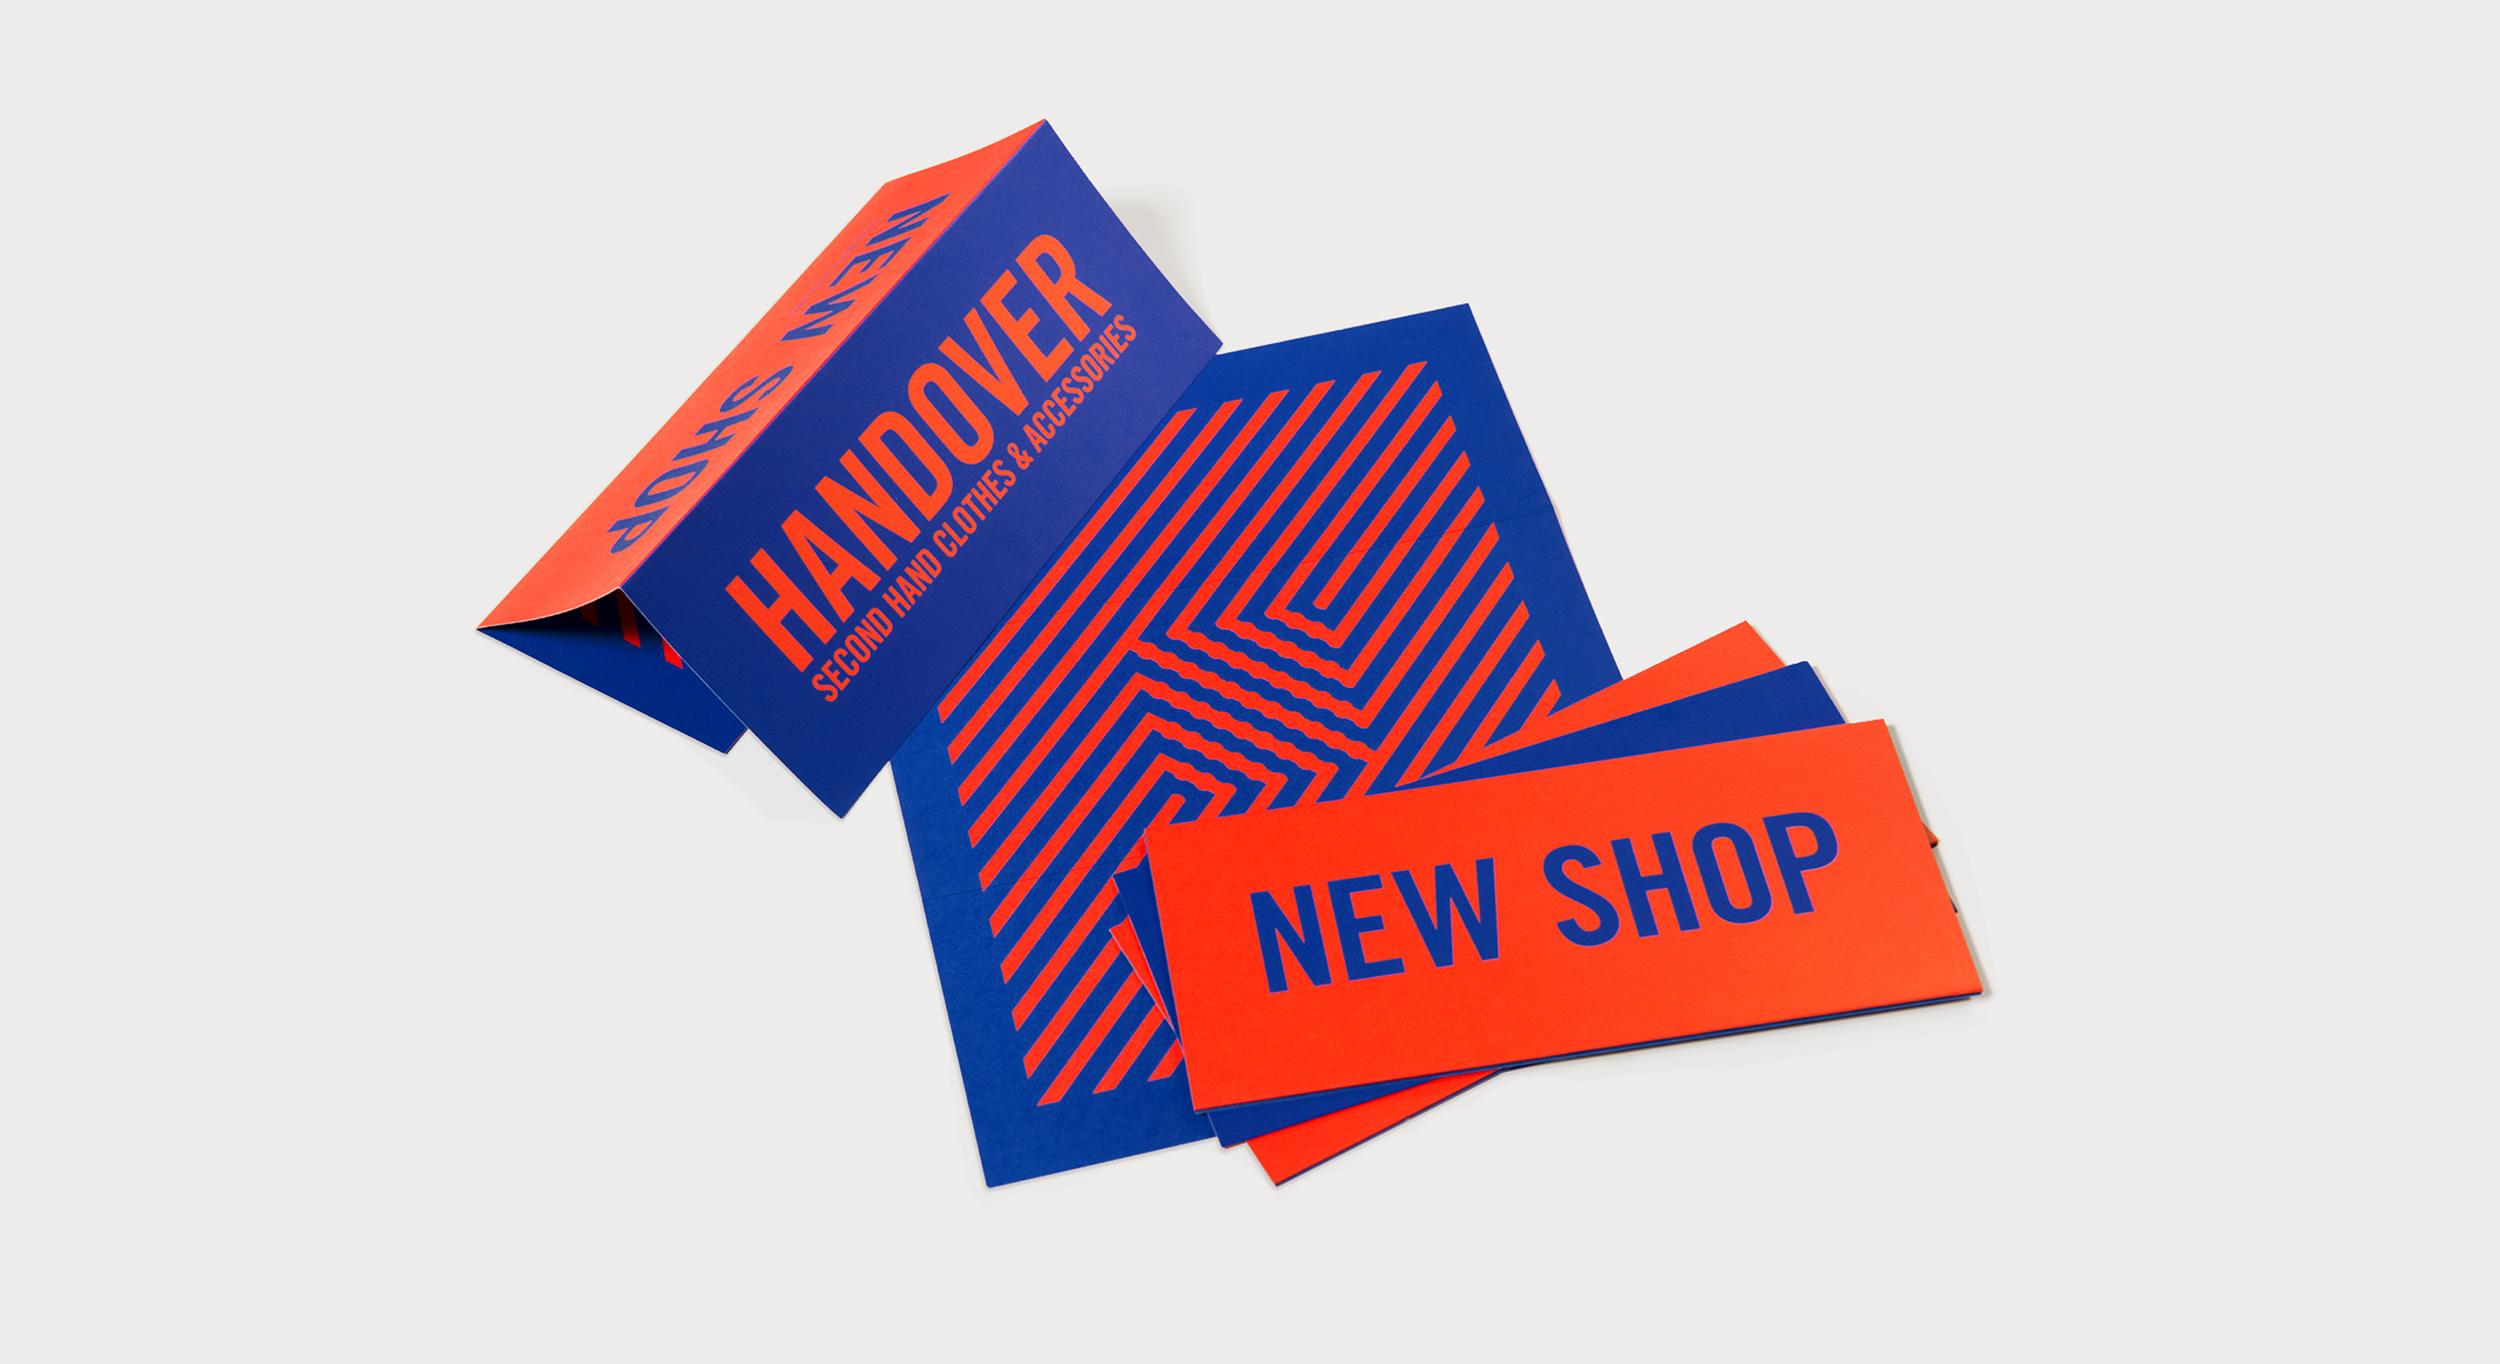 Handover_Banners_Banner-3